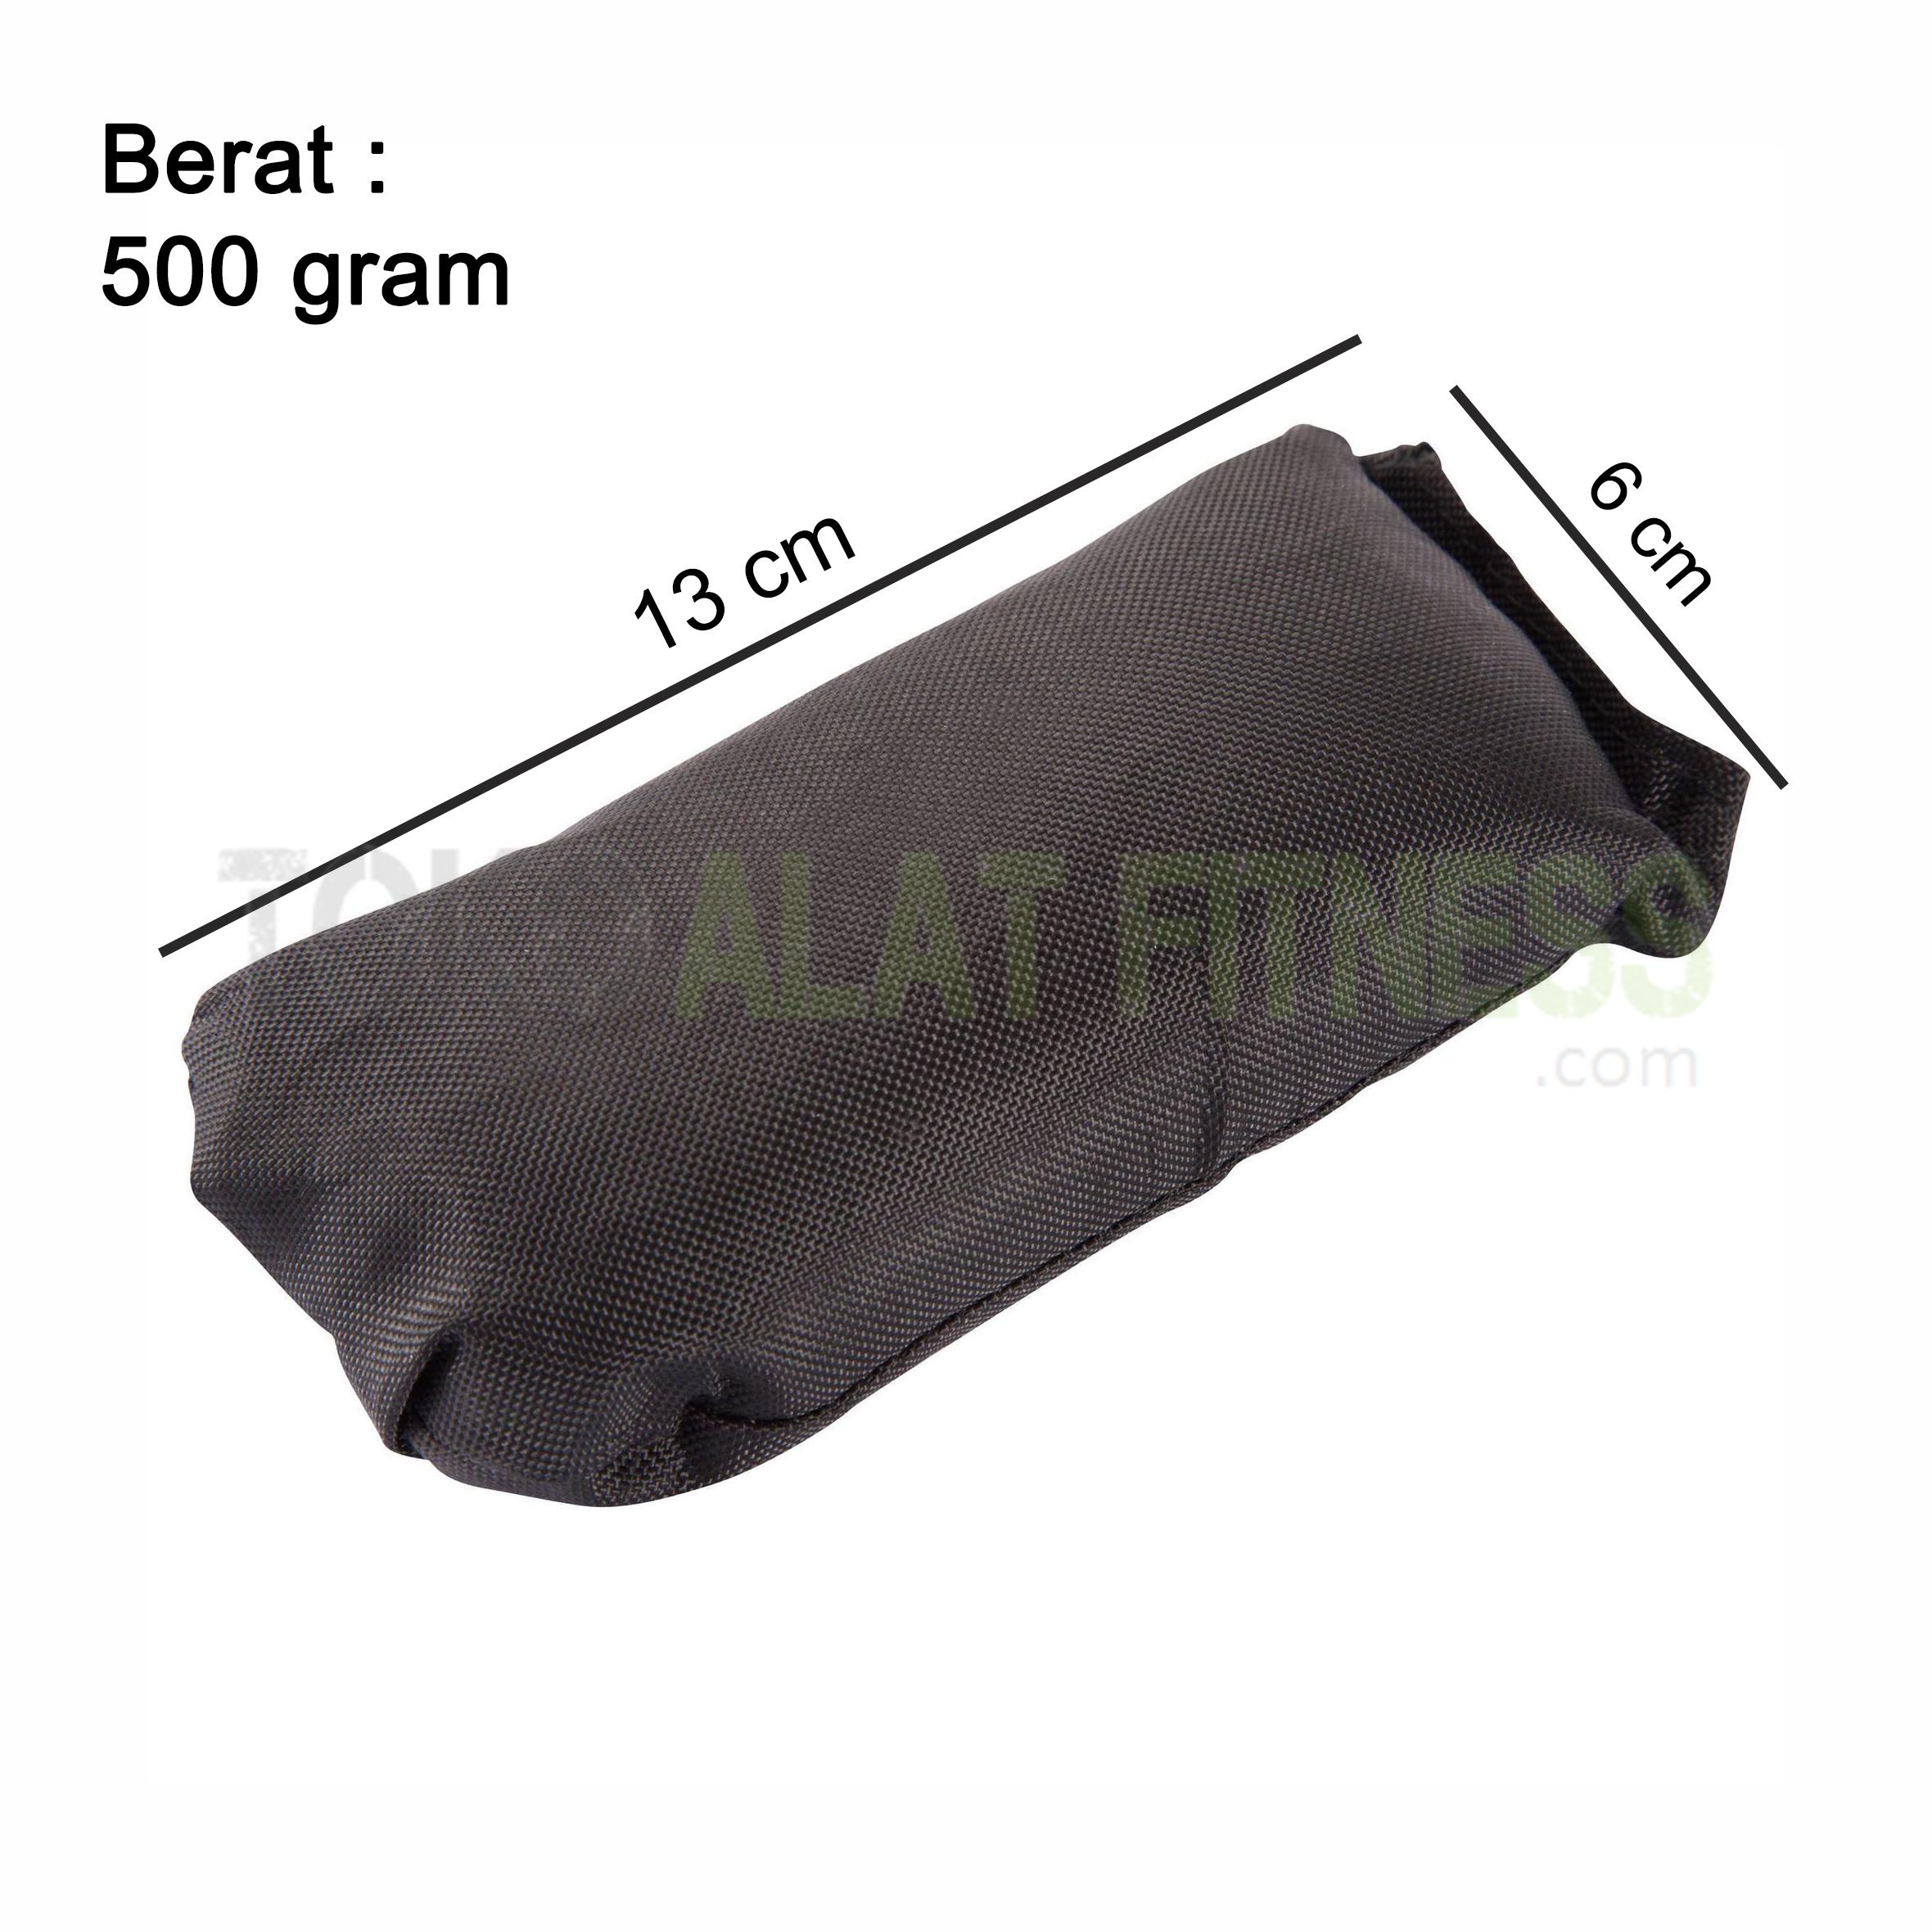 rompi pemberat domyos wtm 7 - Weight Vest/Rompi Pemberat 10kg Domyos - ASSAW39